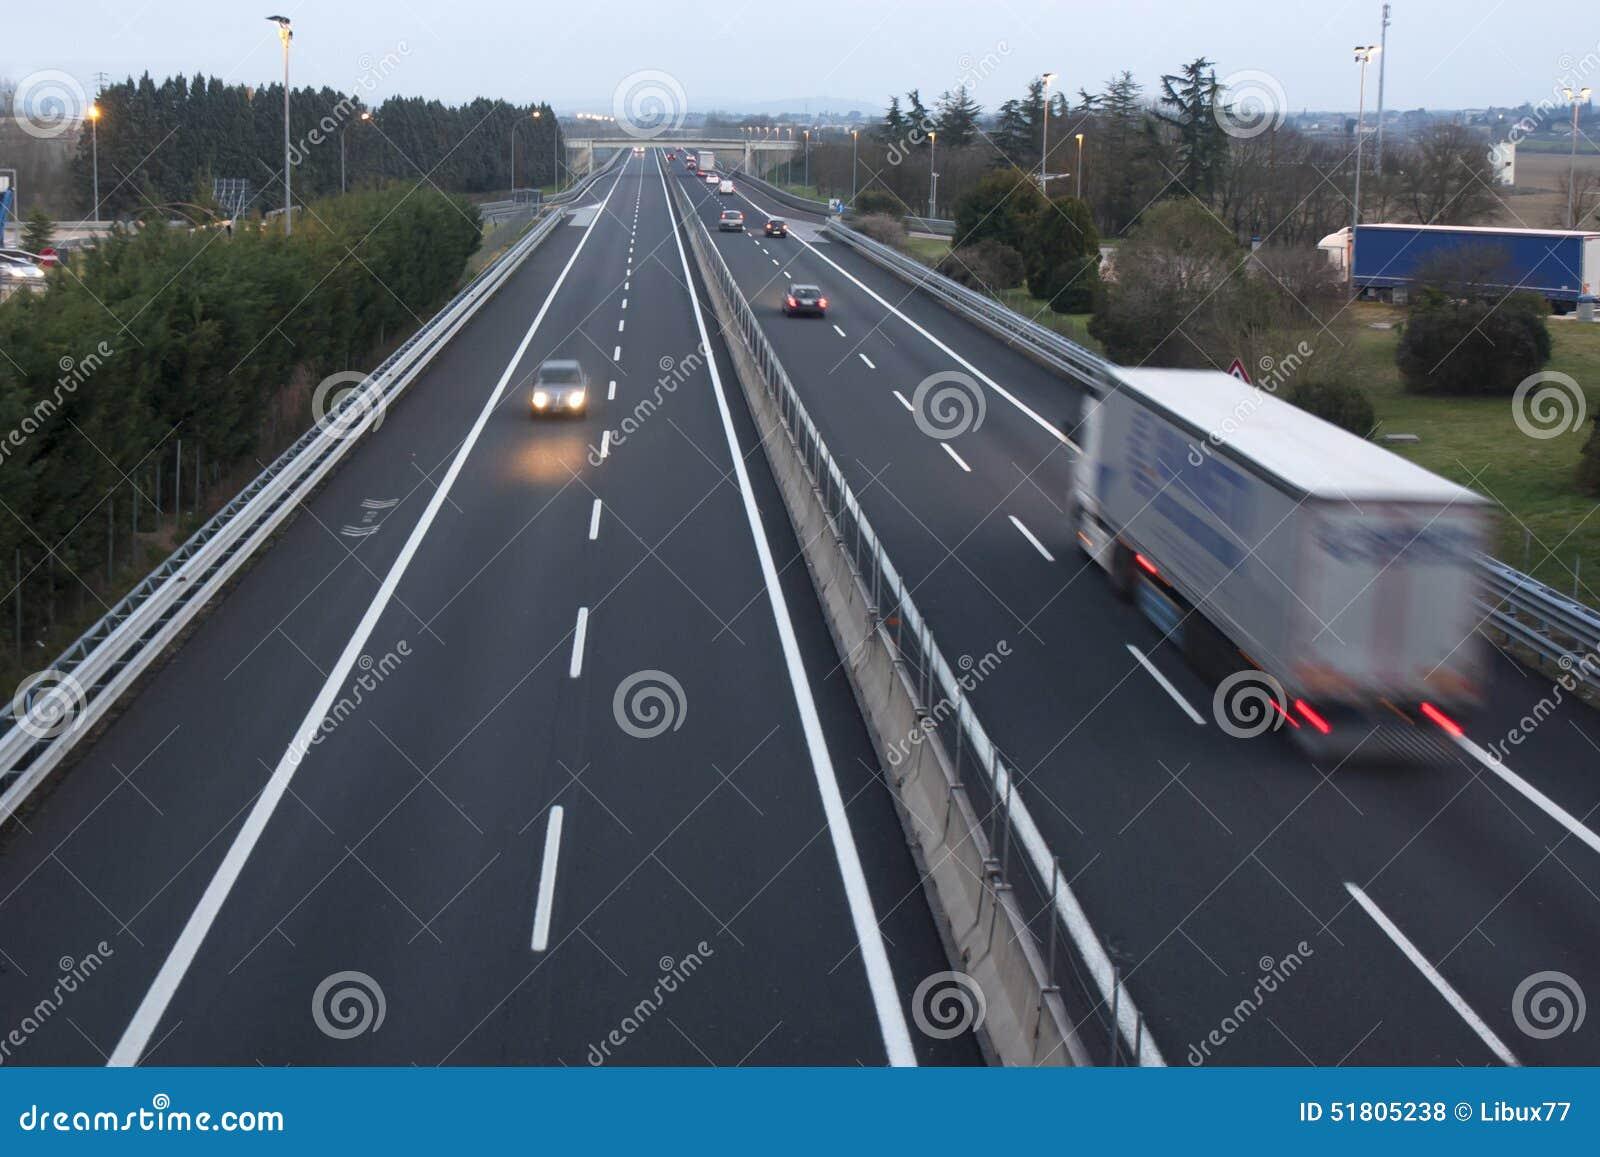 Download Highway Motorway Freeway Cars Trucks Stock Photo - Image of driving, drivers: 51805238